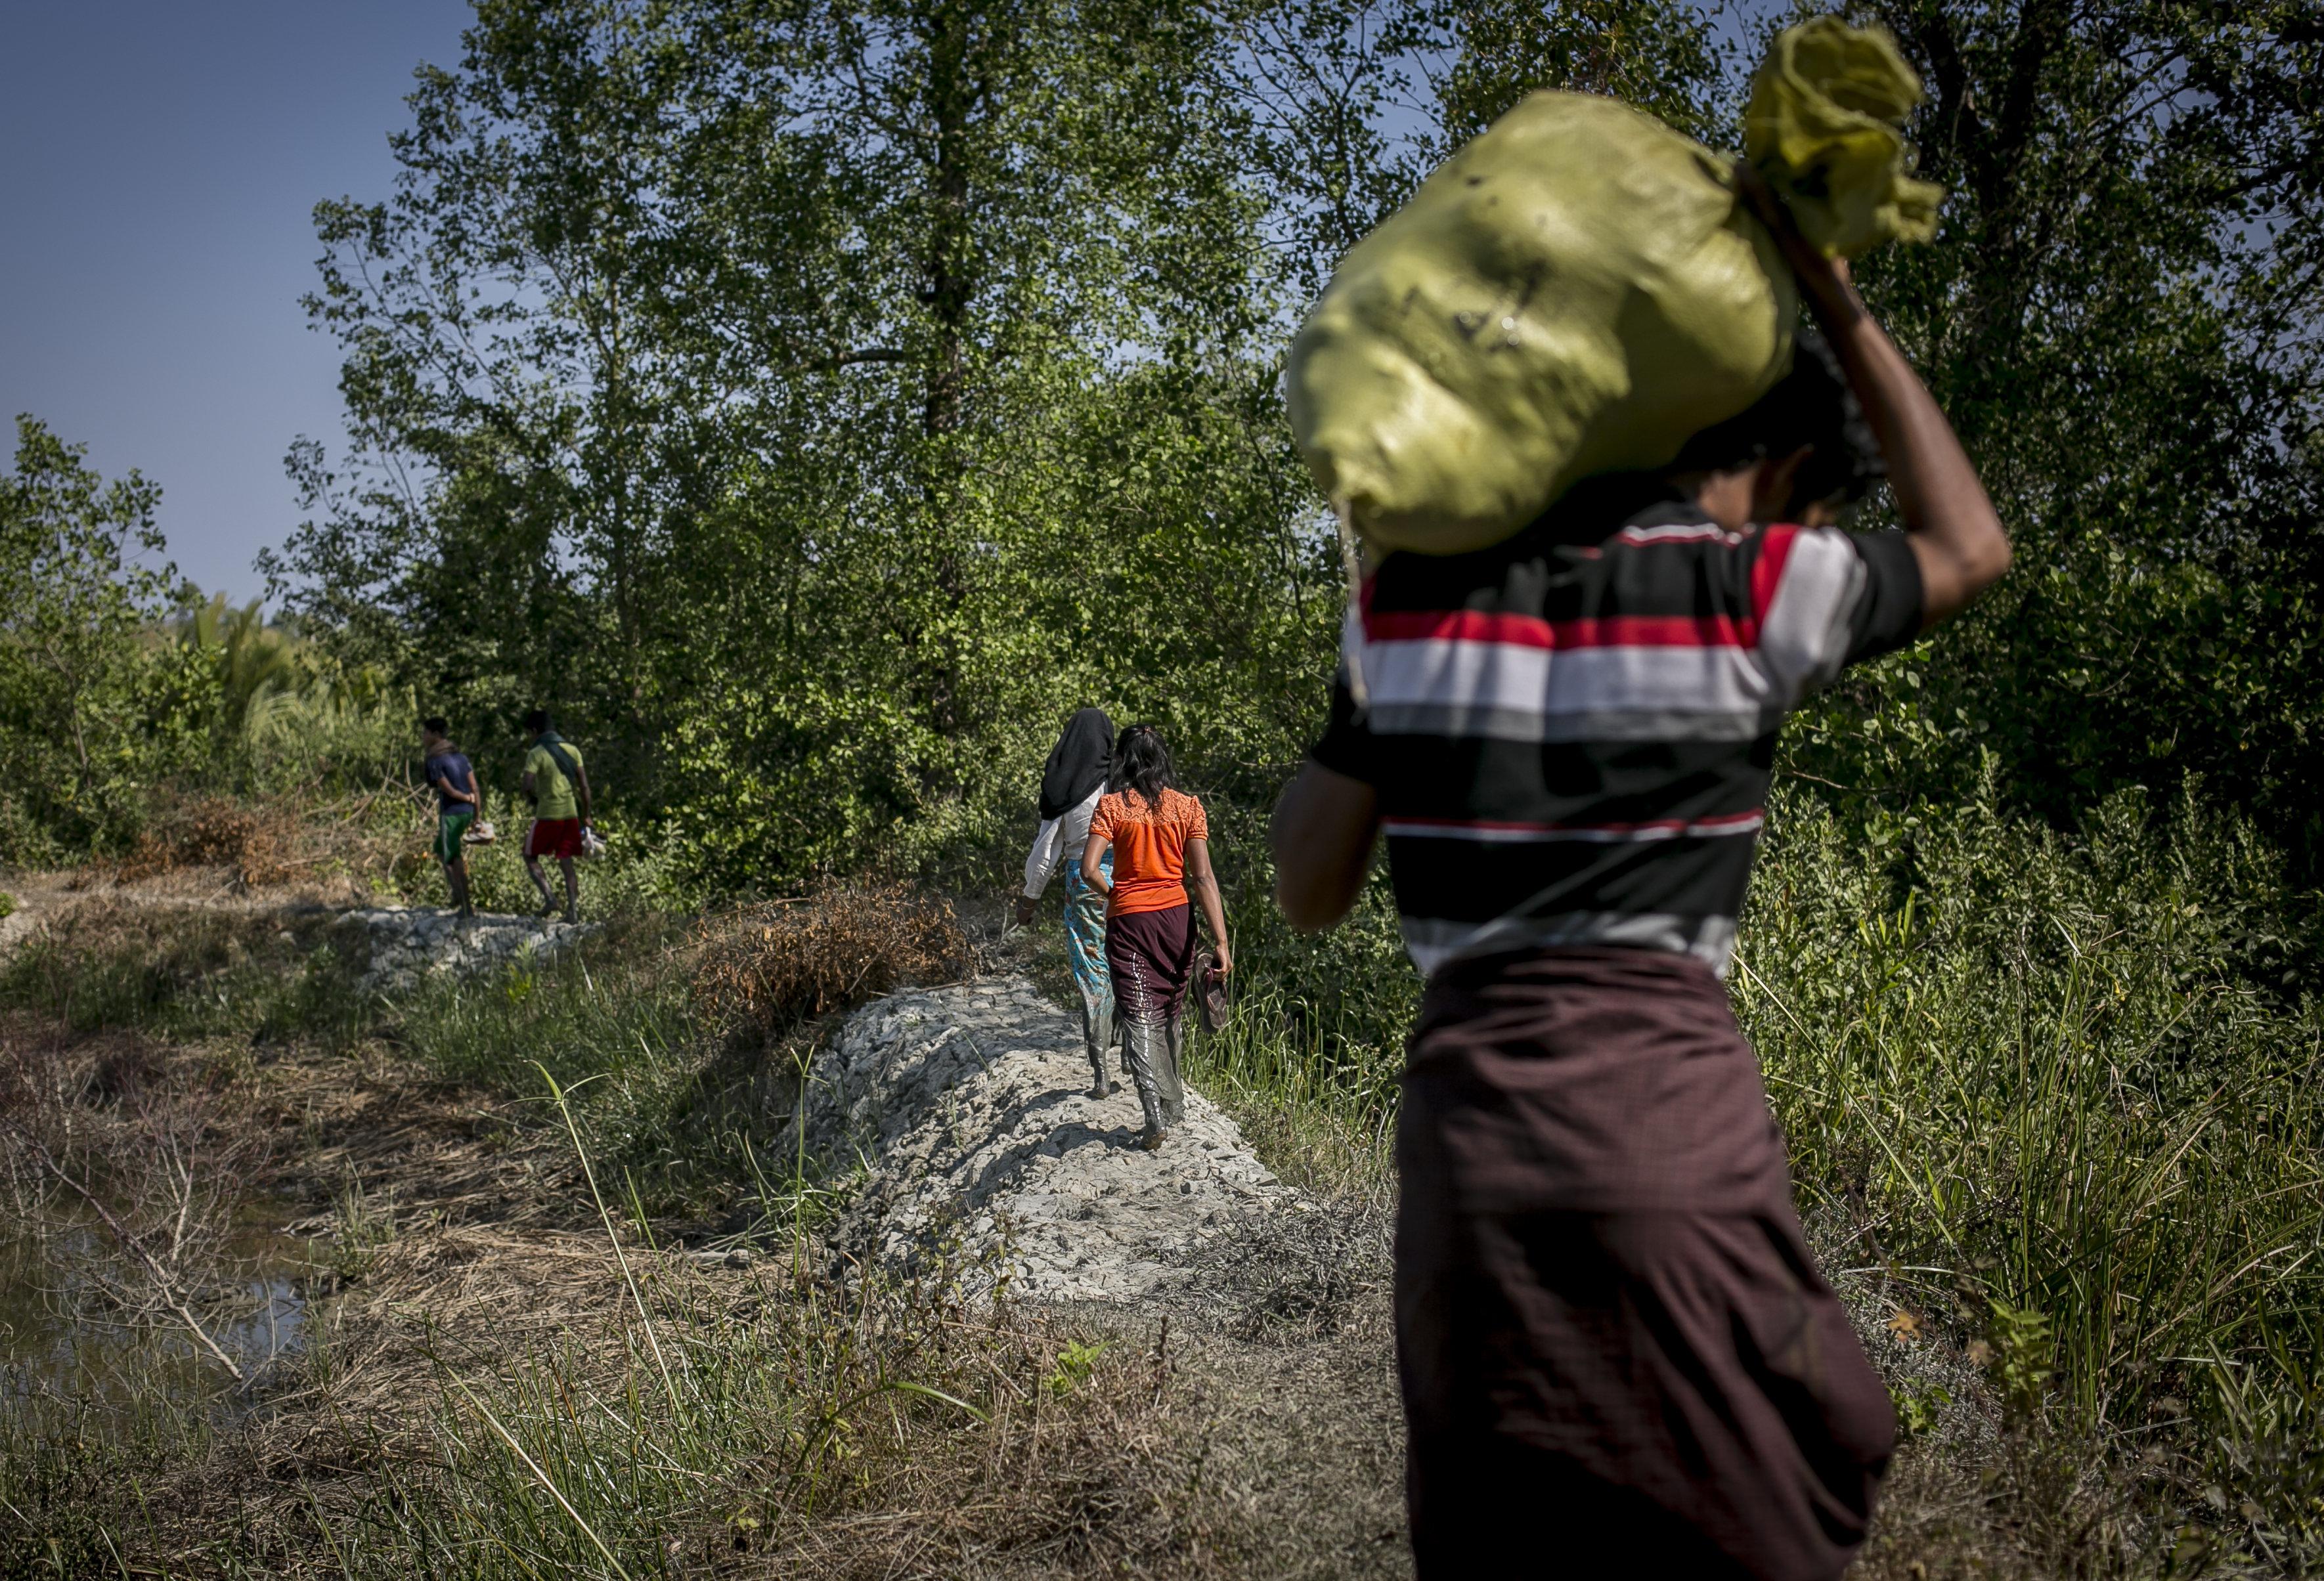 A Rohingya family fleeing from Dekibonia village in Myanmar crosses into Bangladesh on Feb.